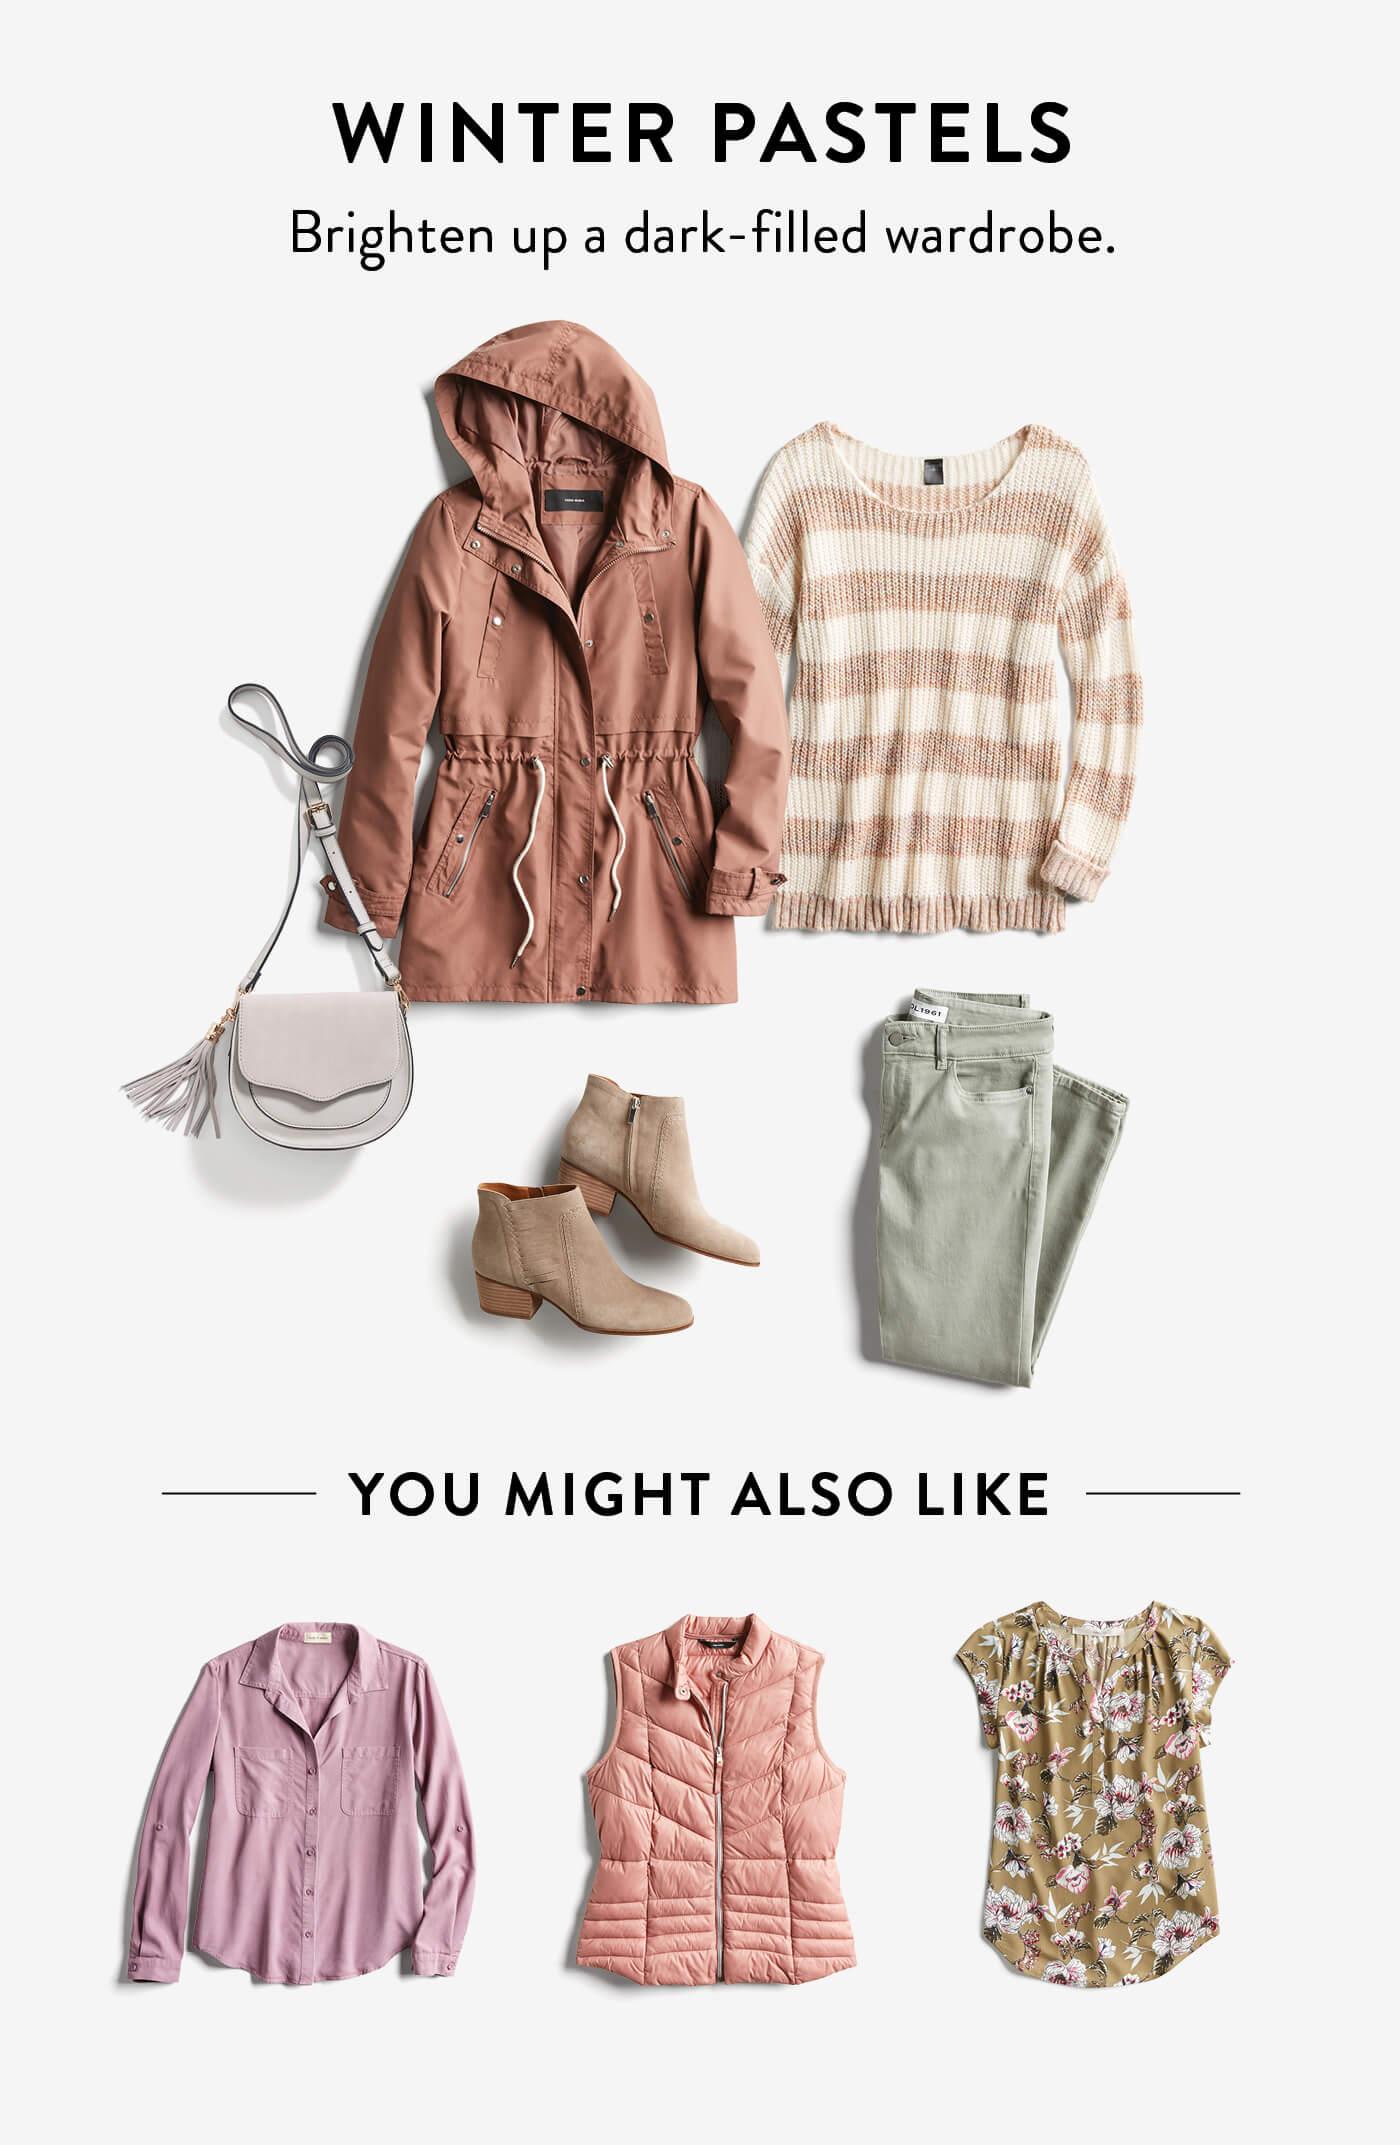 2018 Fashion Trends